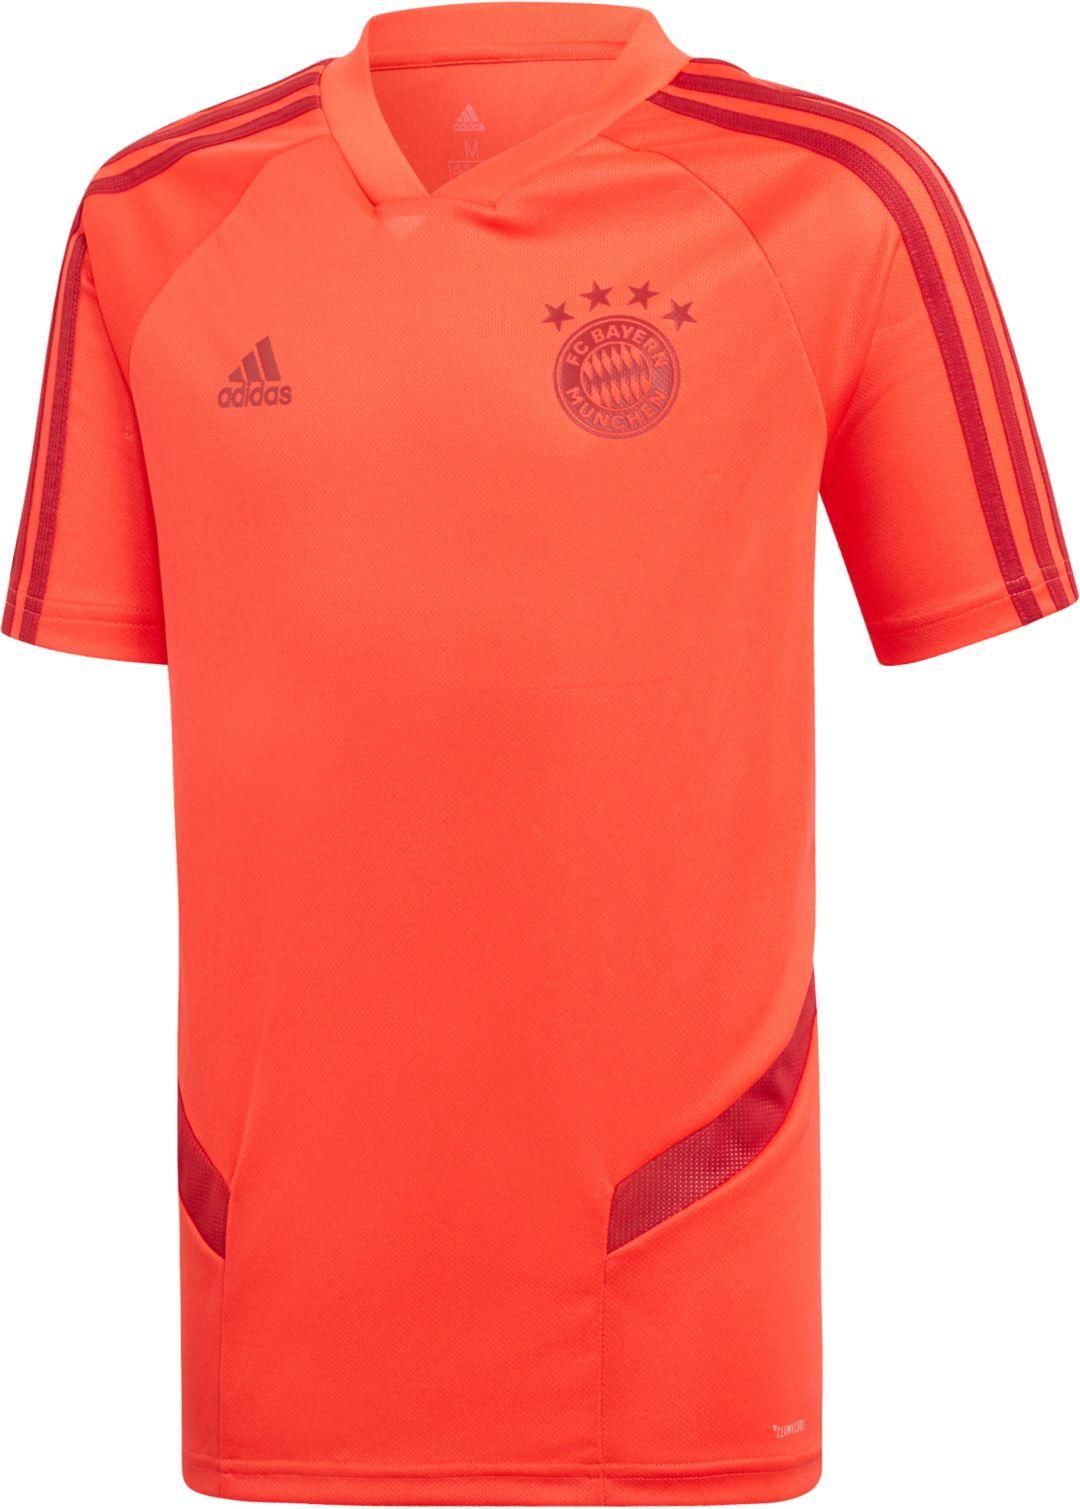 promo code 9d8aa d67b1 adidas Youth Bayern Munich '19 Red Training Jersey